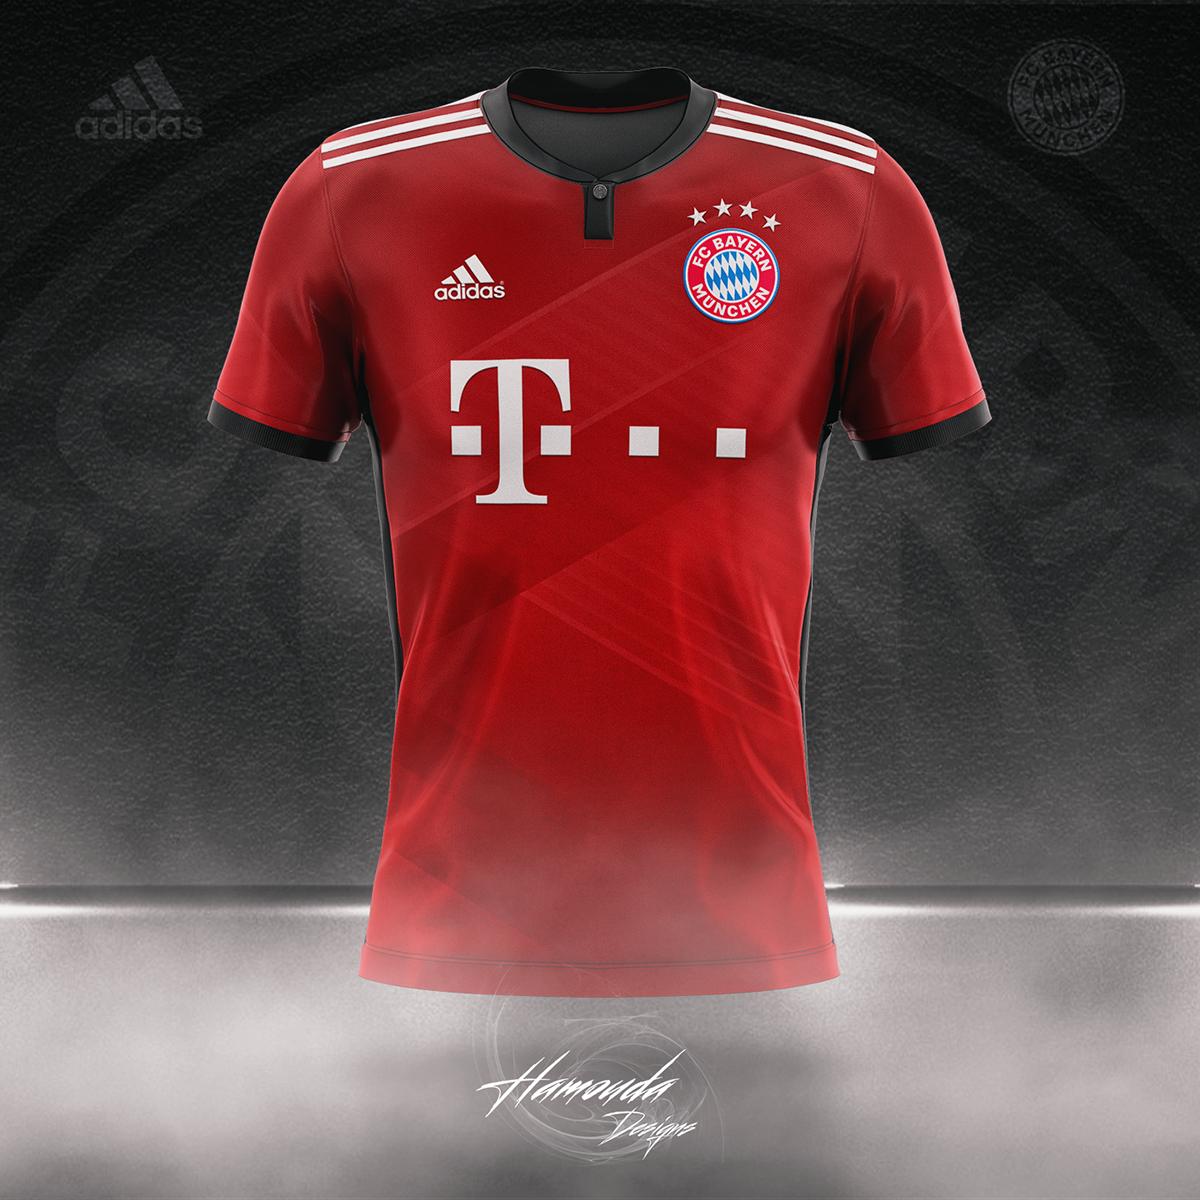 on sale 7eddd 1ad48 BAYERN MUNICH - Football Concept Kit 2018/2019 on Pantone ...